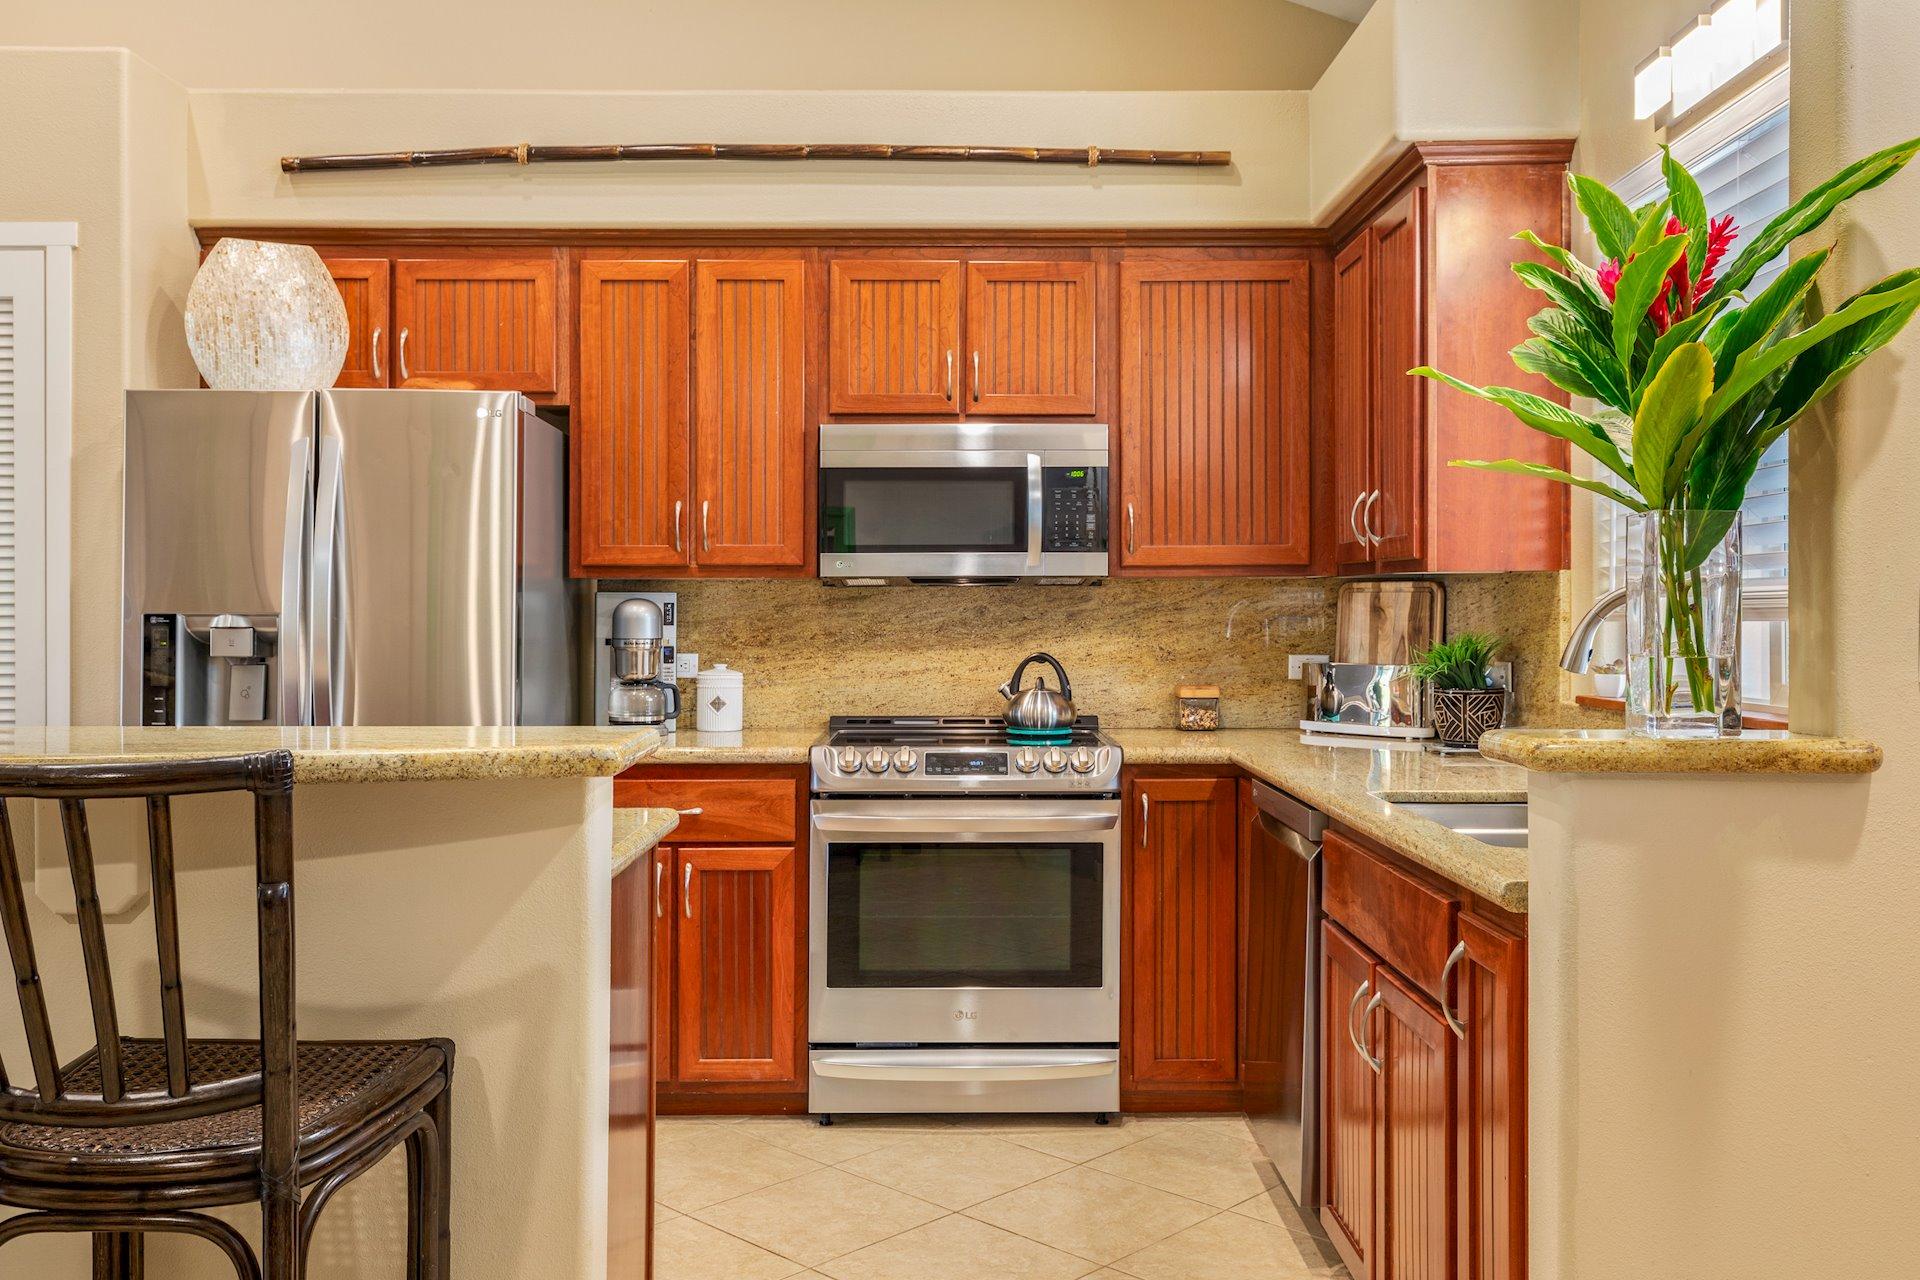 Enjoy meal prep in this wonderful kitchen